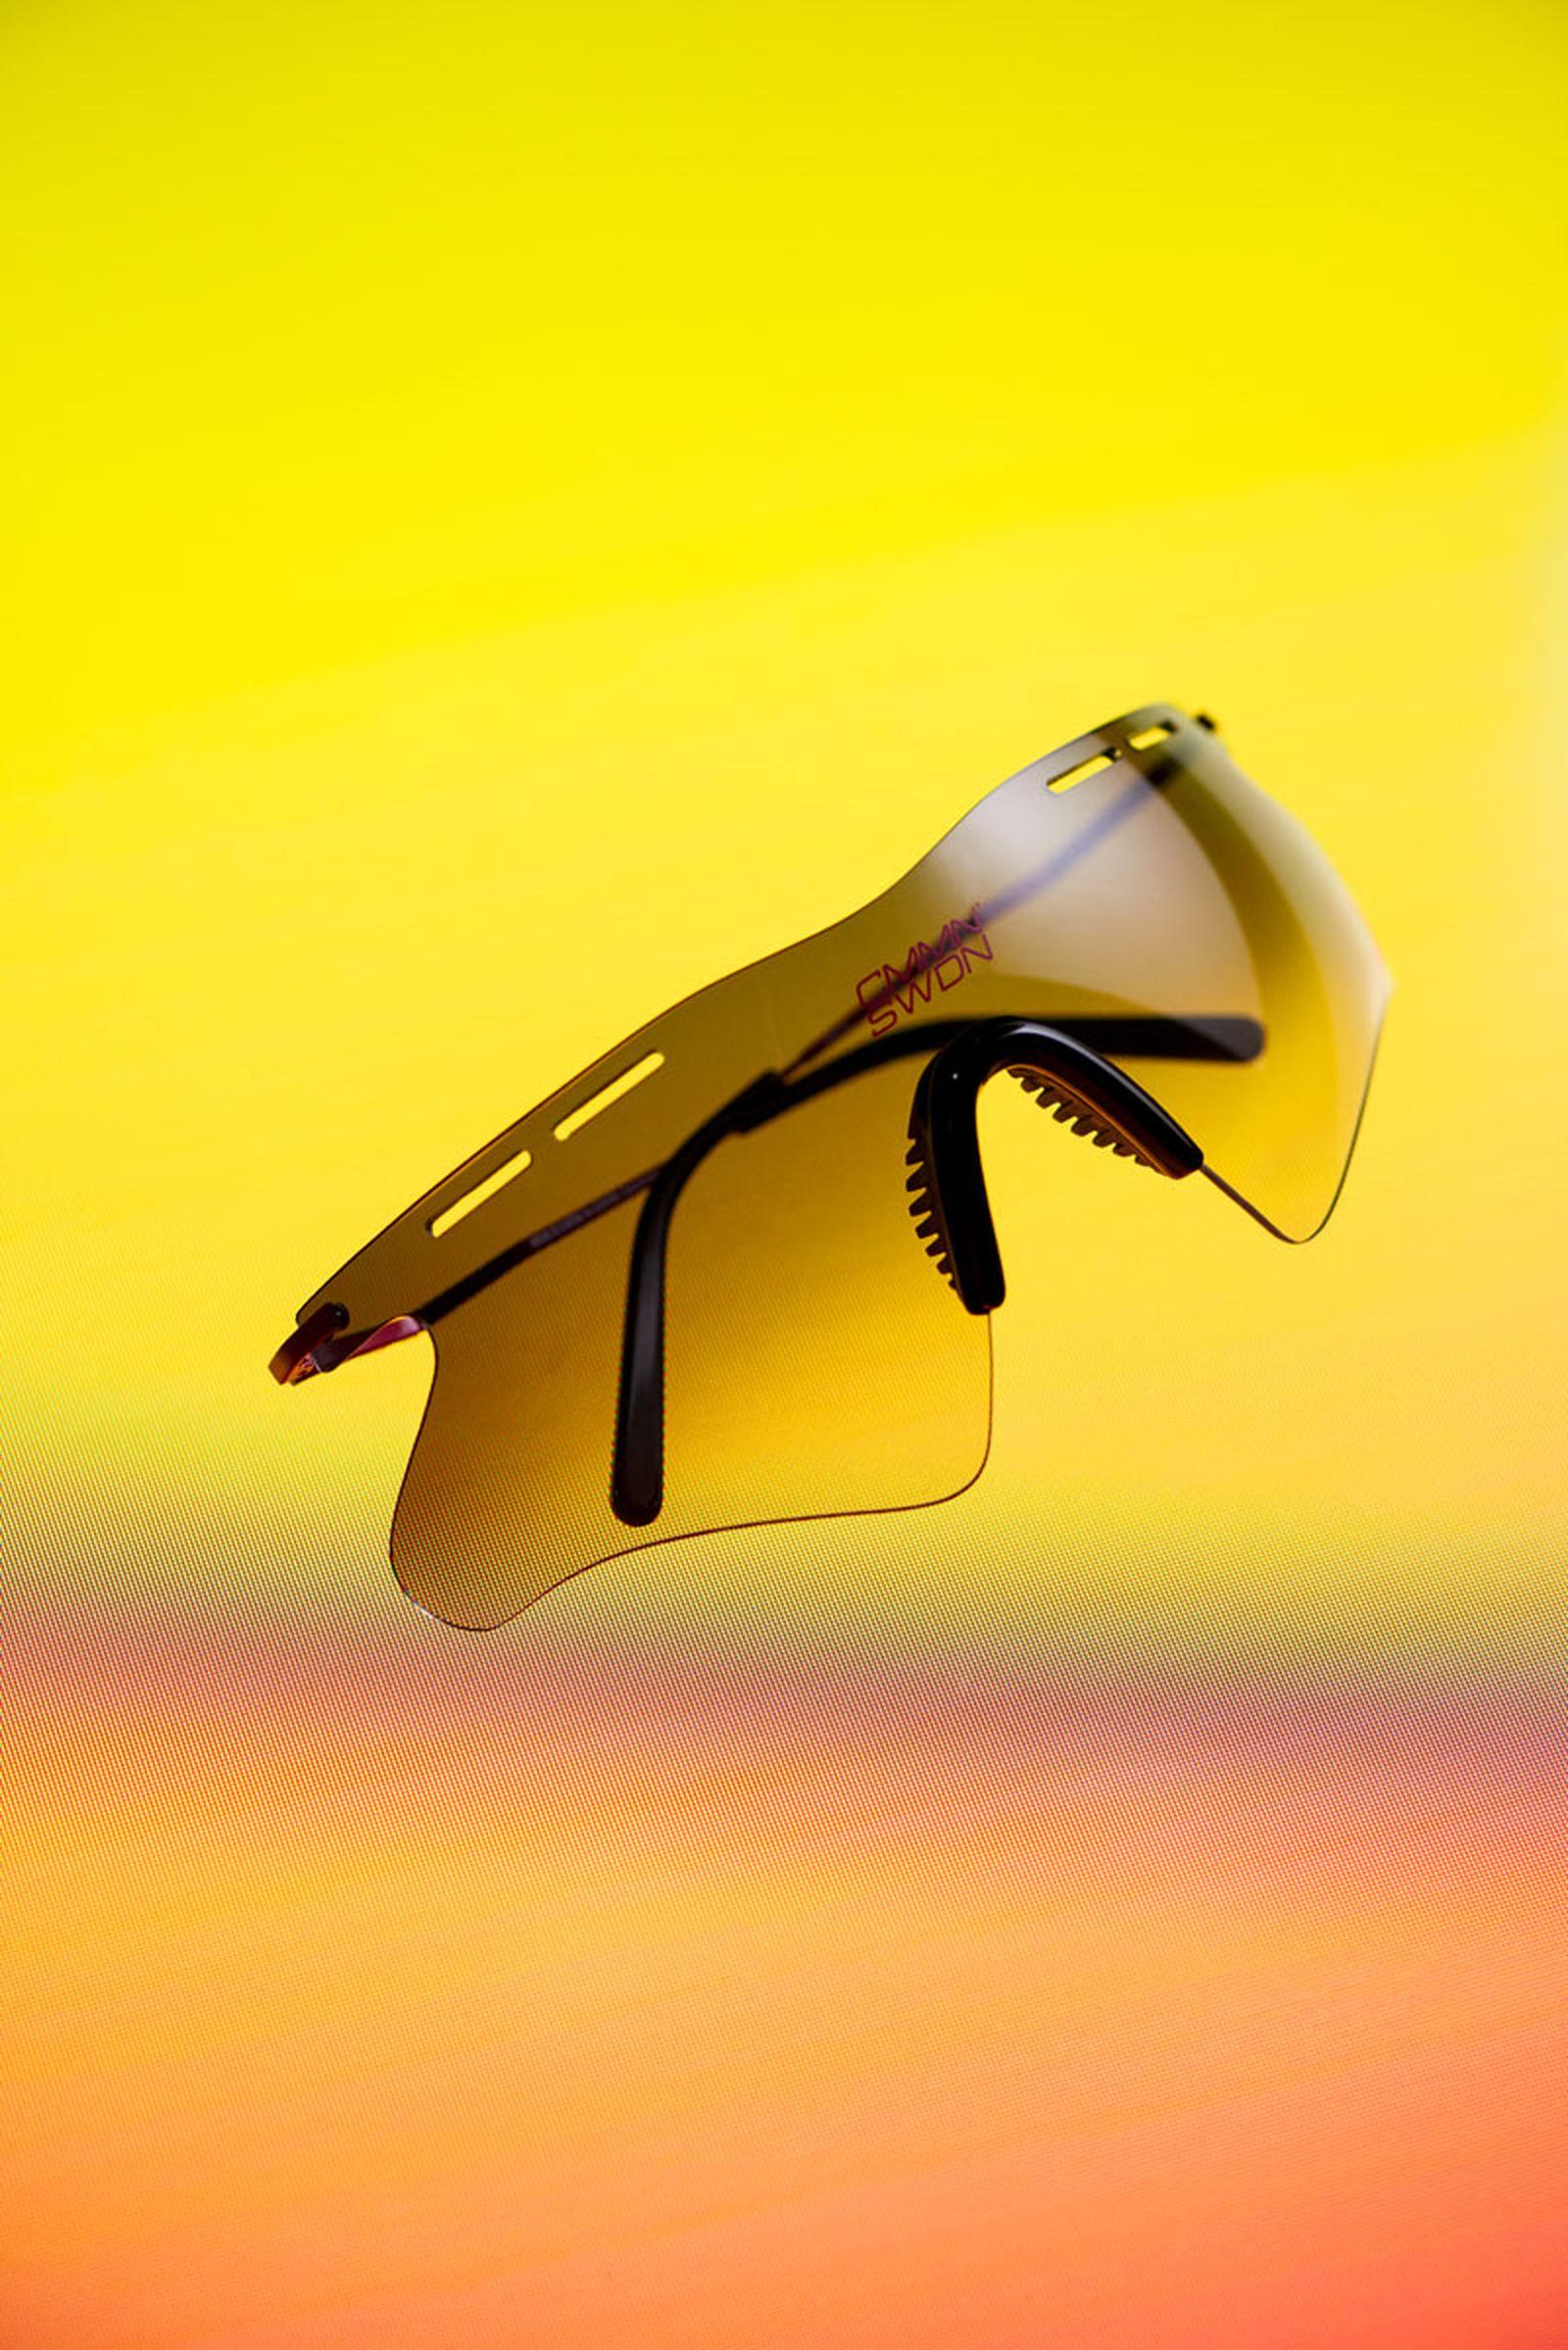 4cmmn swdn sunglasses ss19 Ace & Tate